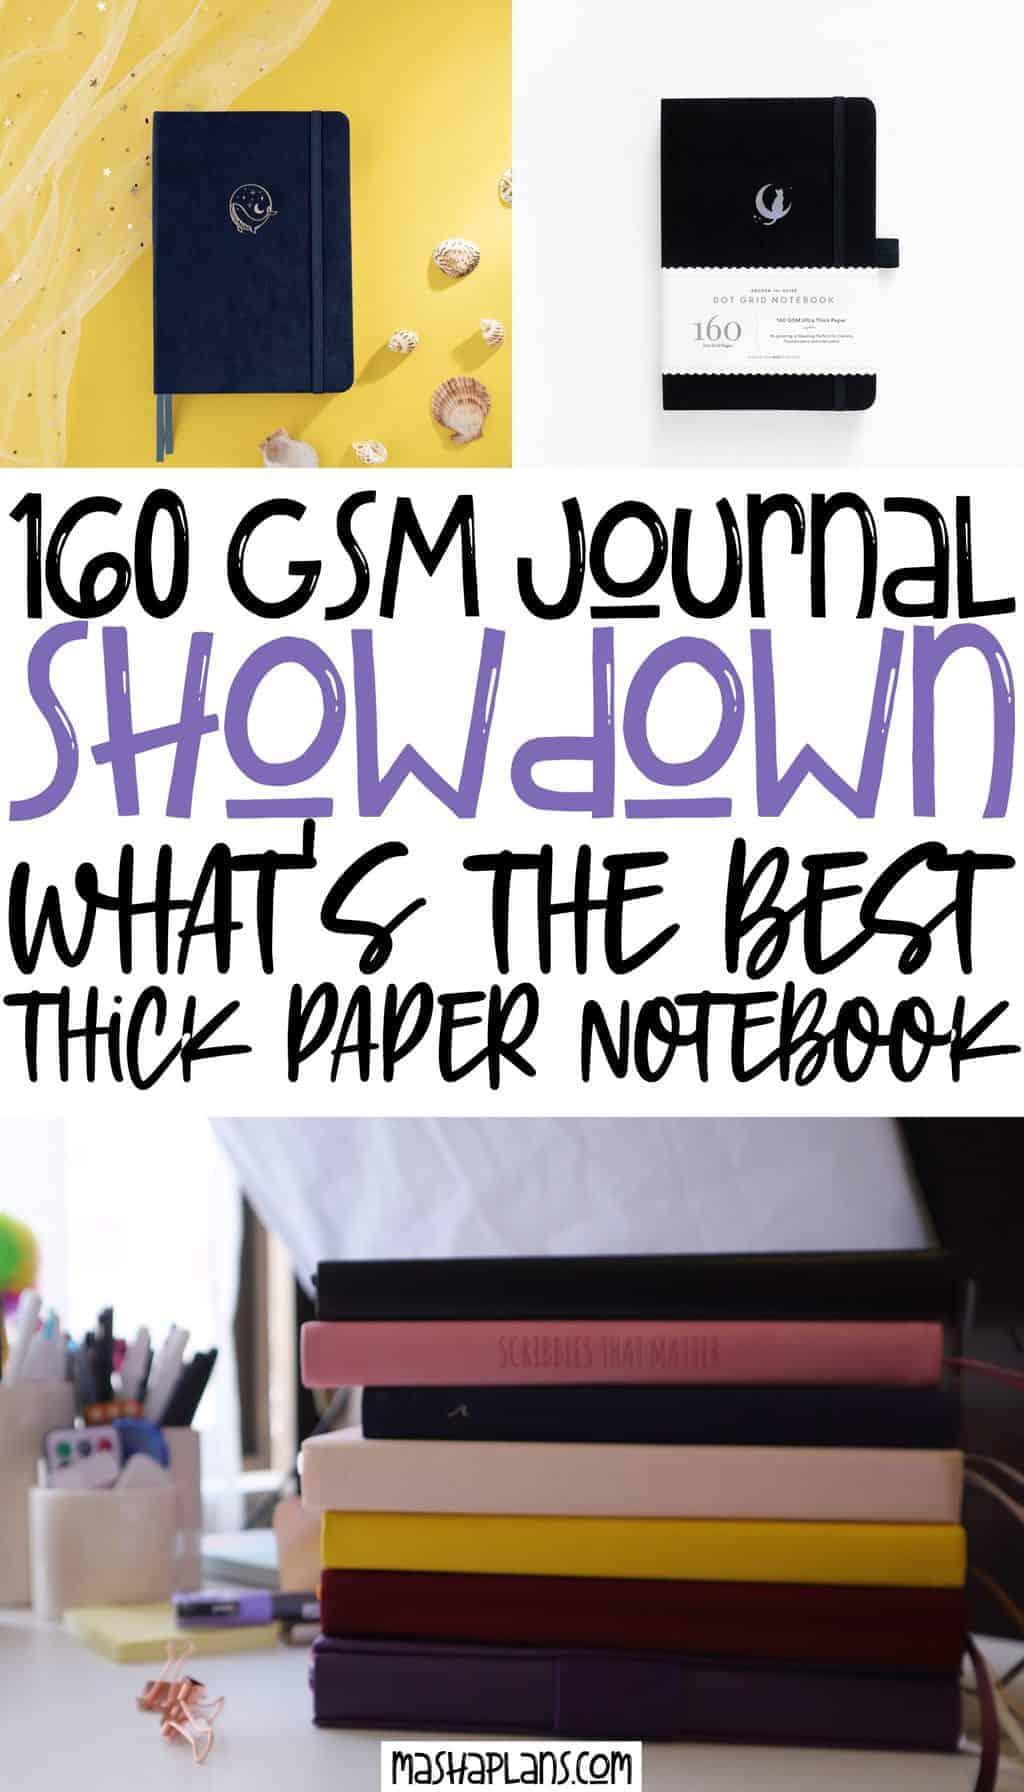 Best 160 GSM Bullet Journal Notebooks: The Ultimate Comparison | Masha Plans